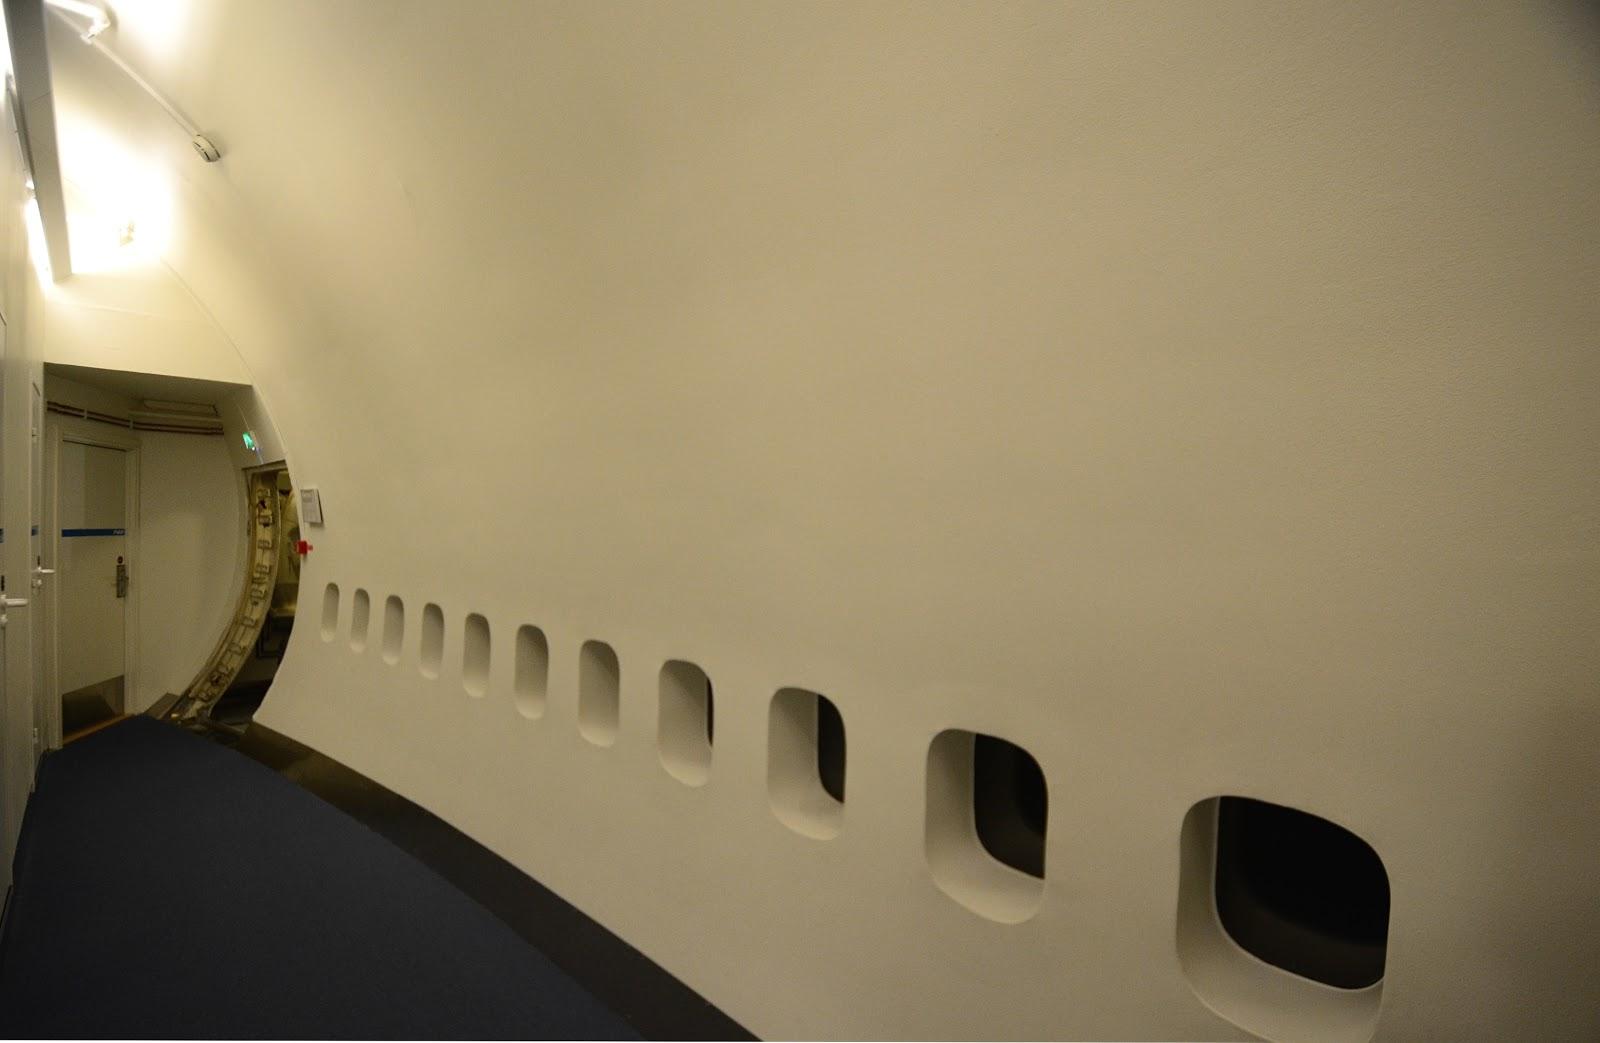 http://1.bp.blogspot.com/-549TR9Vc1vQ/UIOZrMtsmJI/AAAAAAAAHBg/TyYW5cafF0E/s1600/blog81_rearcorridor.jpg